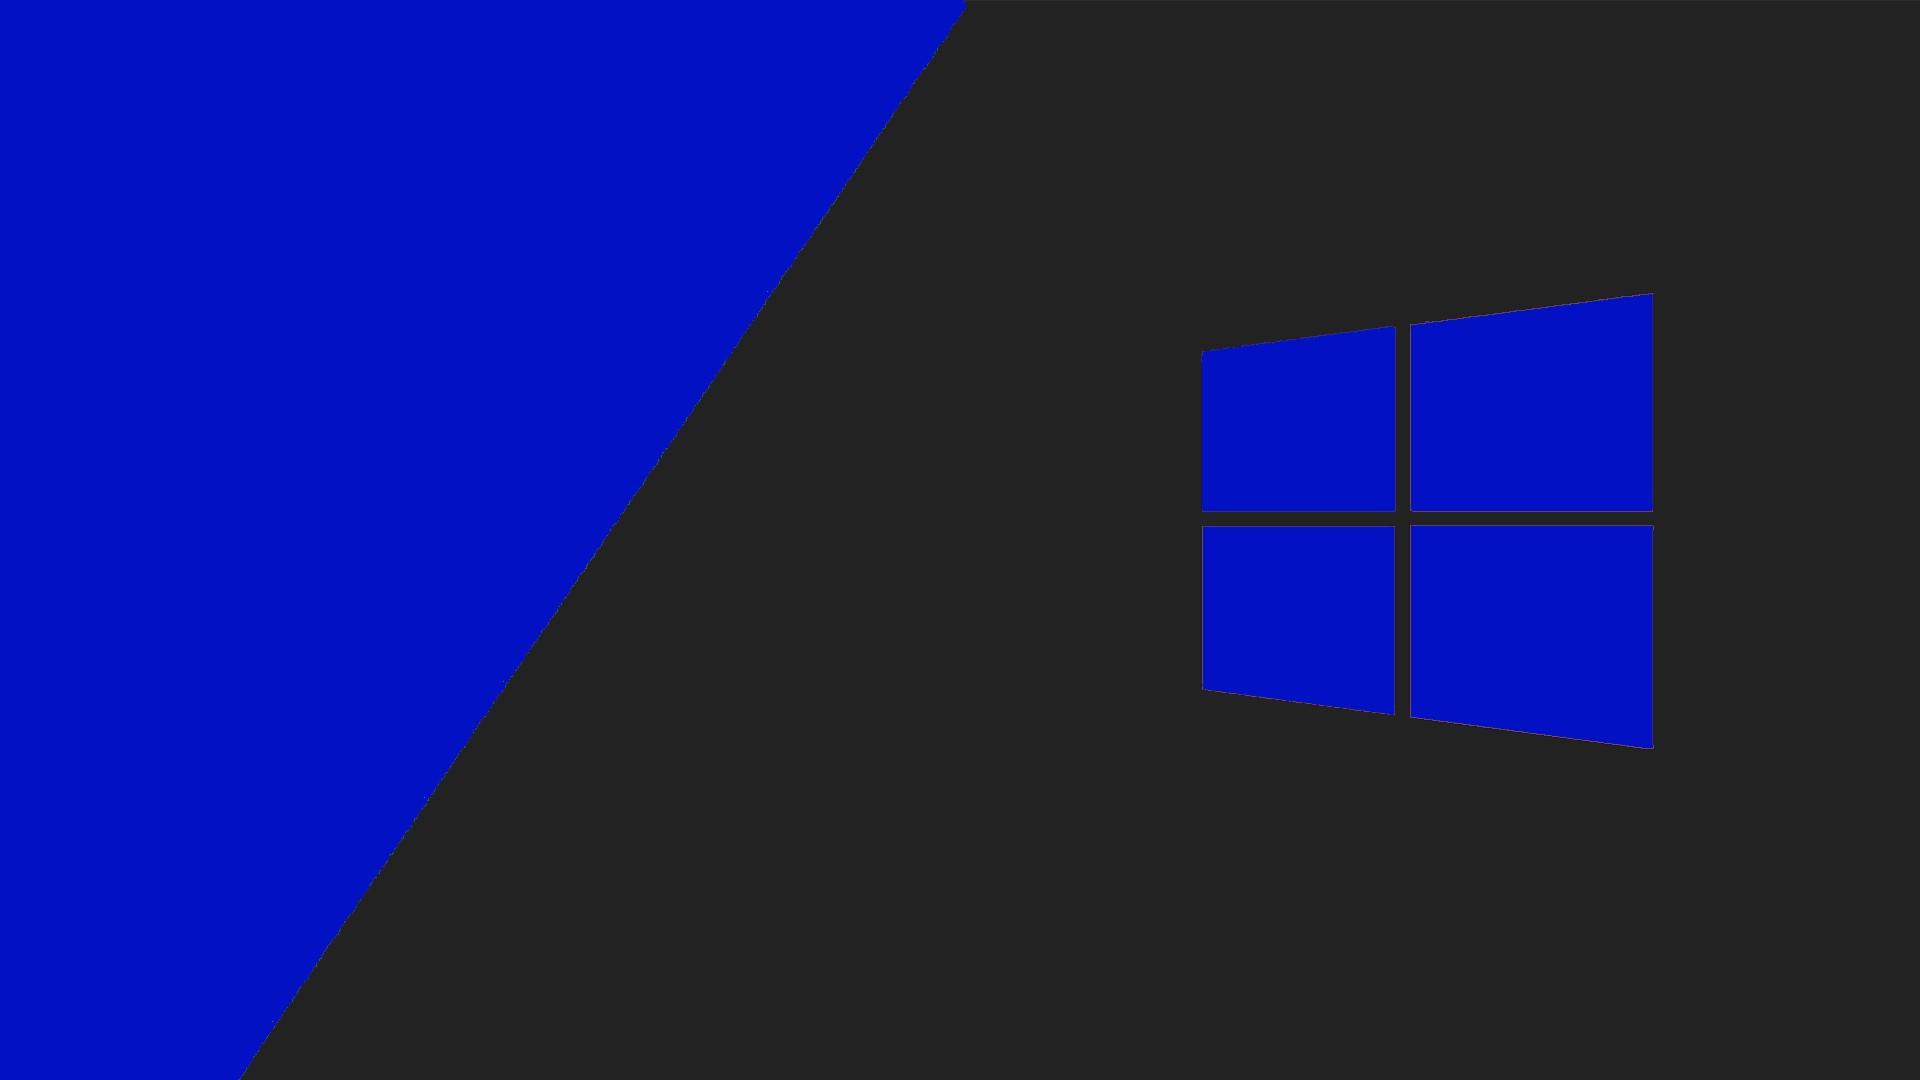 Wallpaper 1920x1080 Px Colorful Window Windows 10 1920x1080